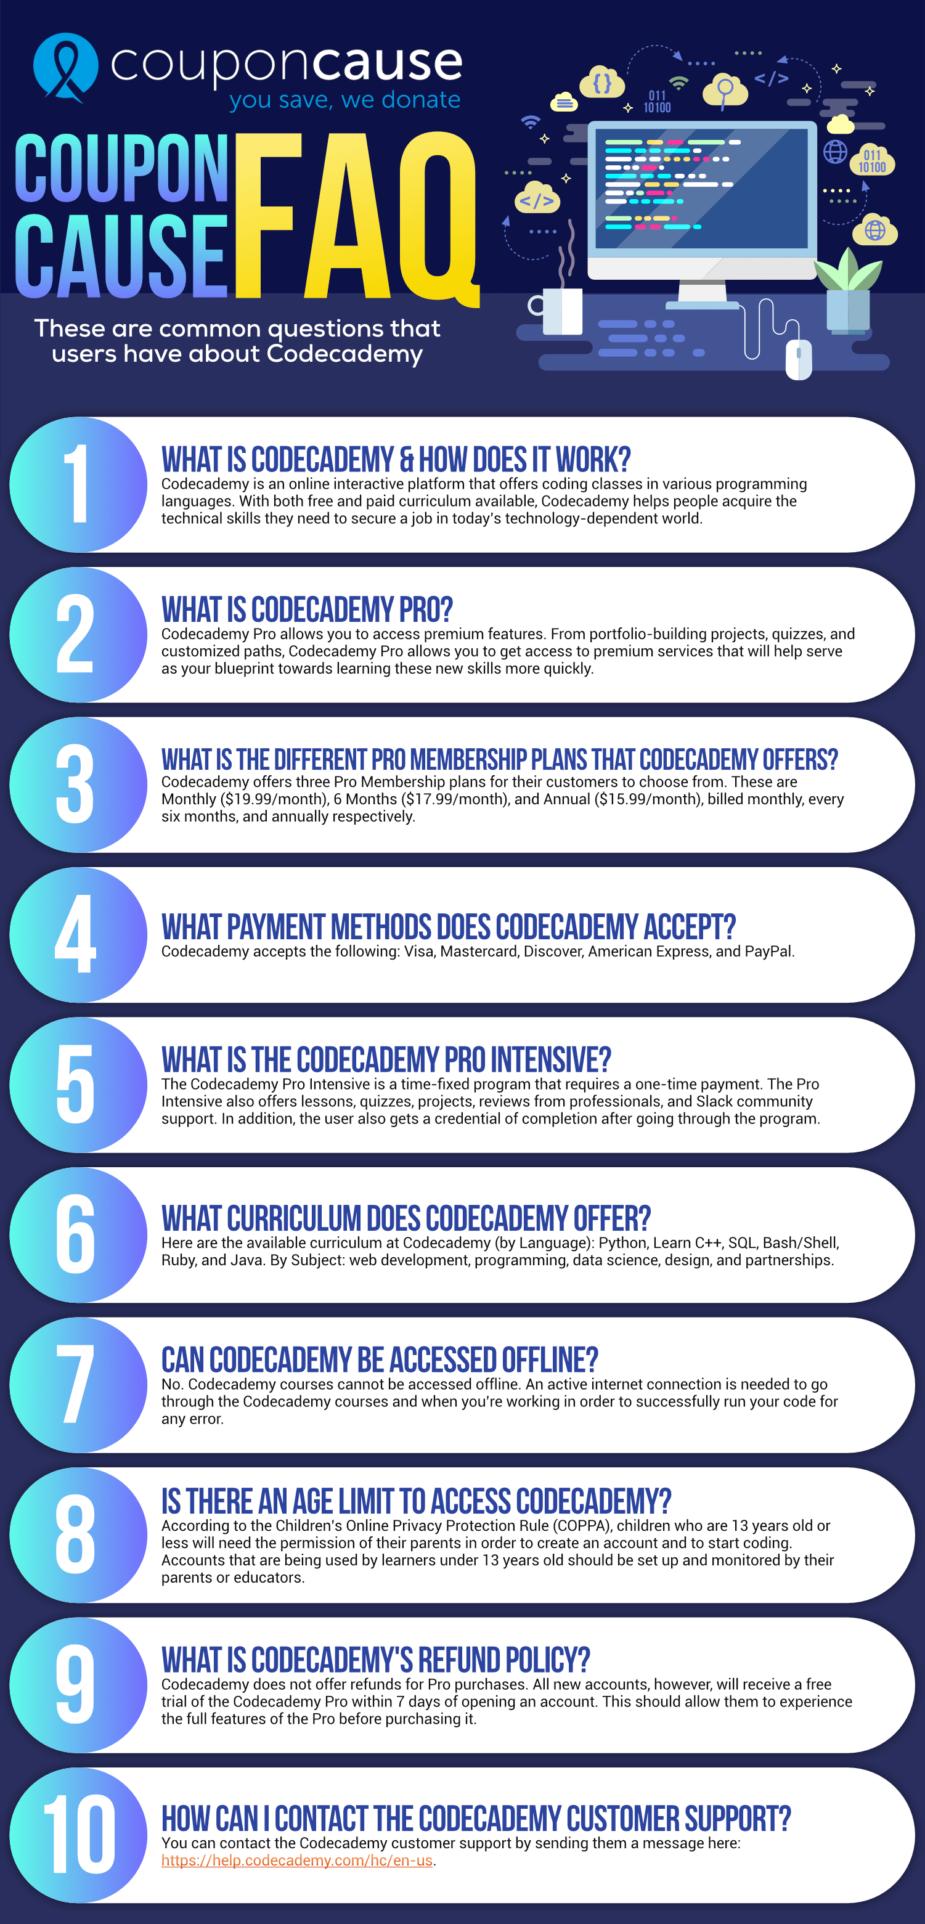 Codecademy Coupon Cause FAQ (C.C. FAQ)